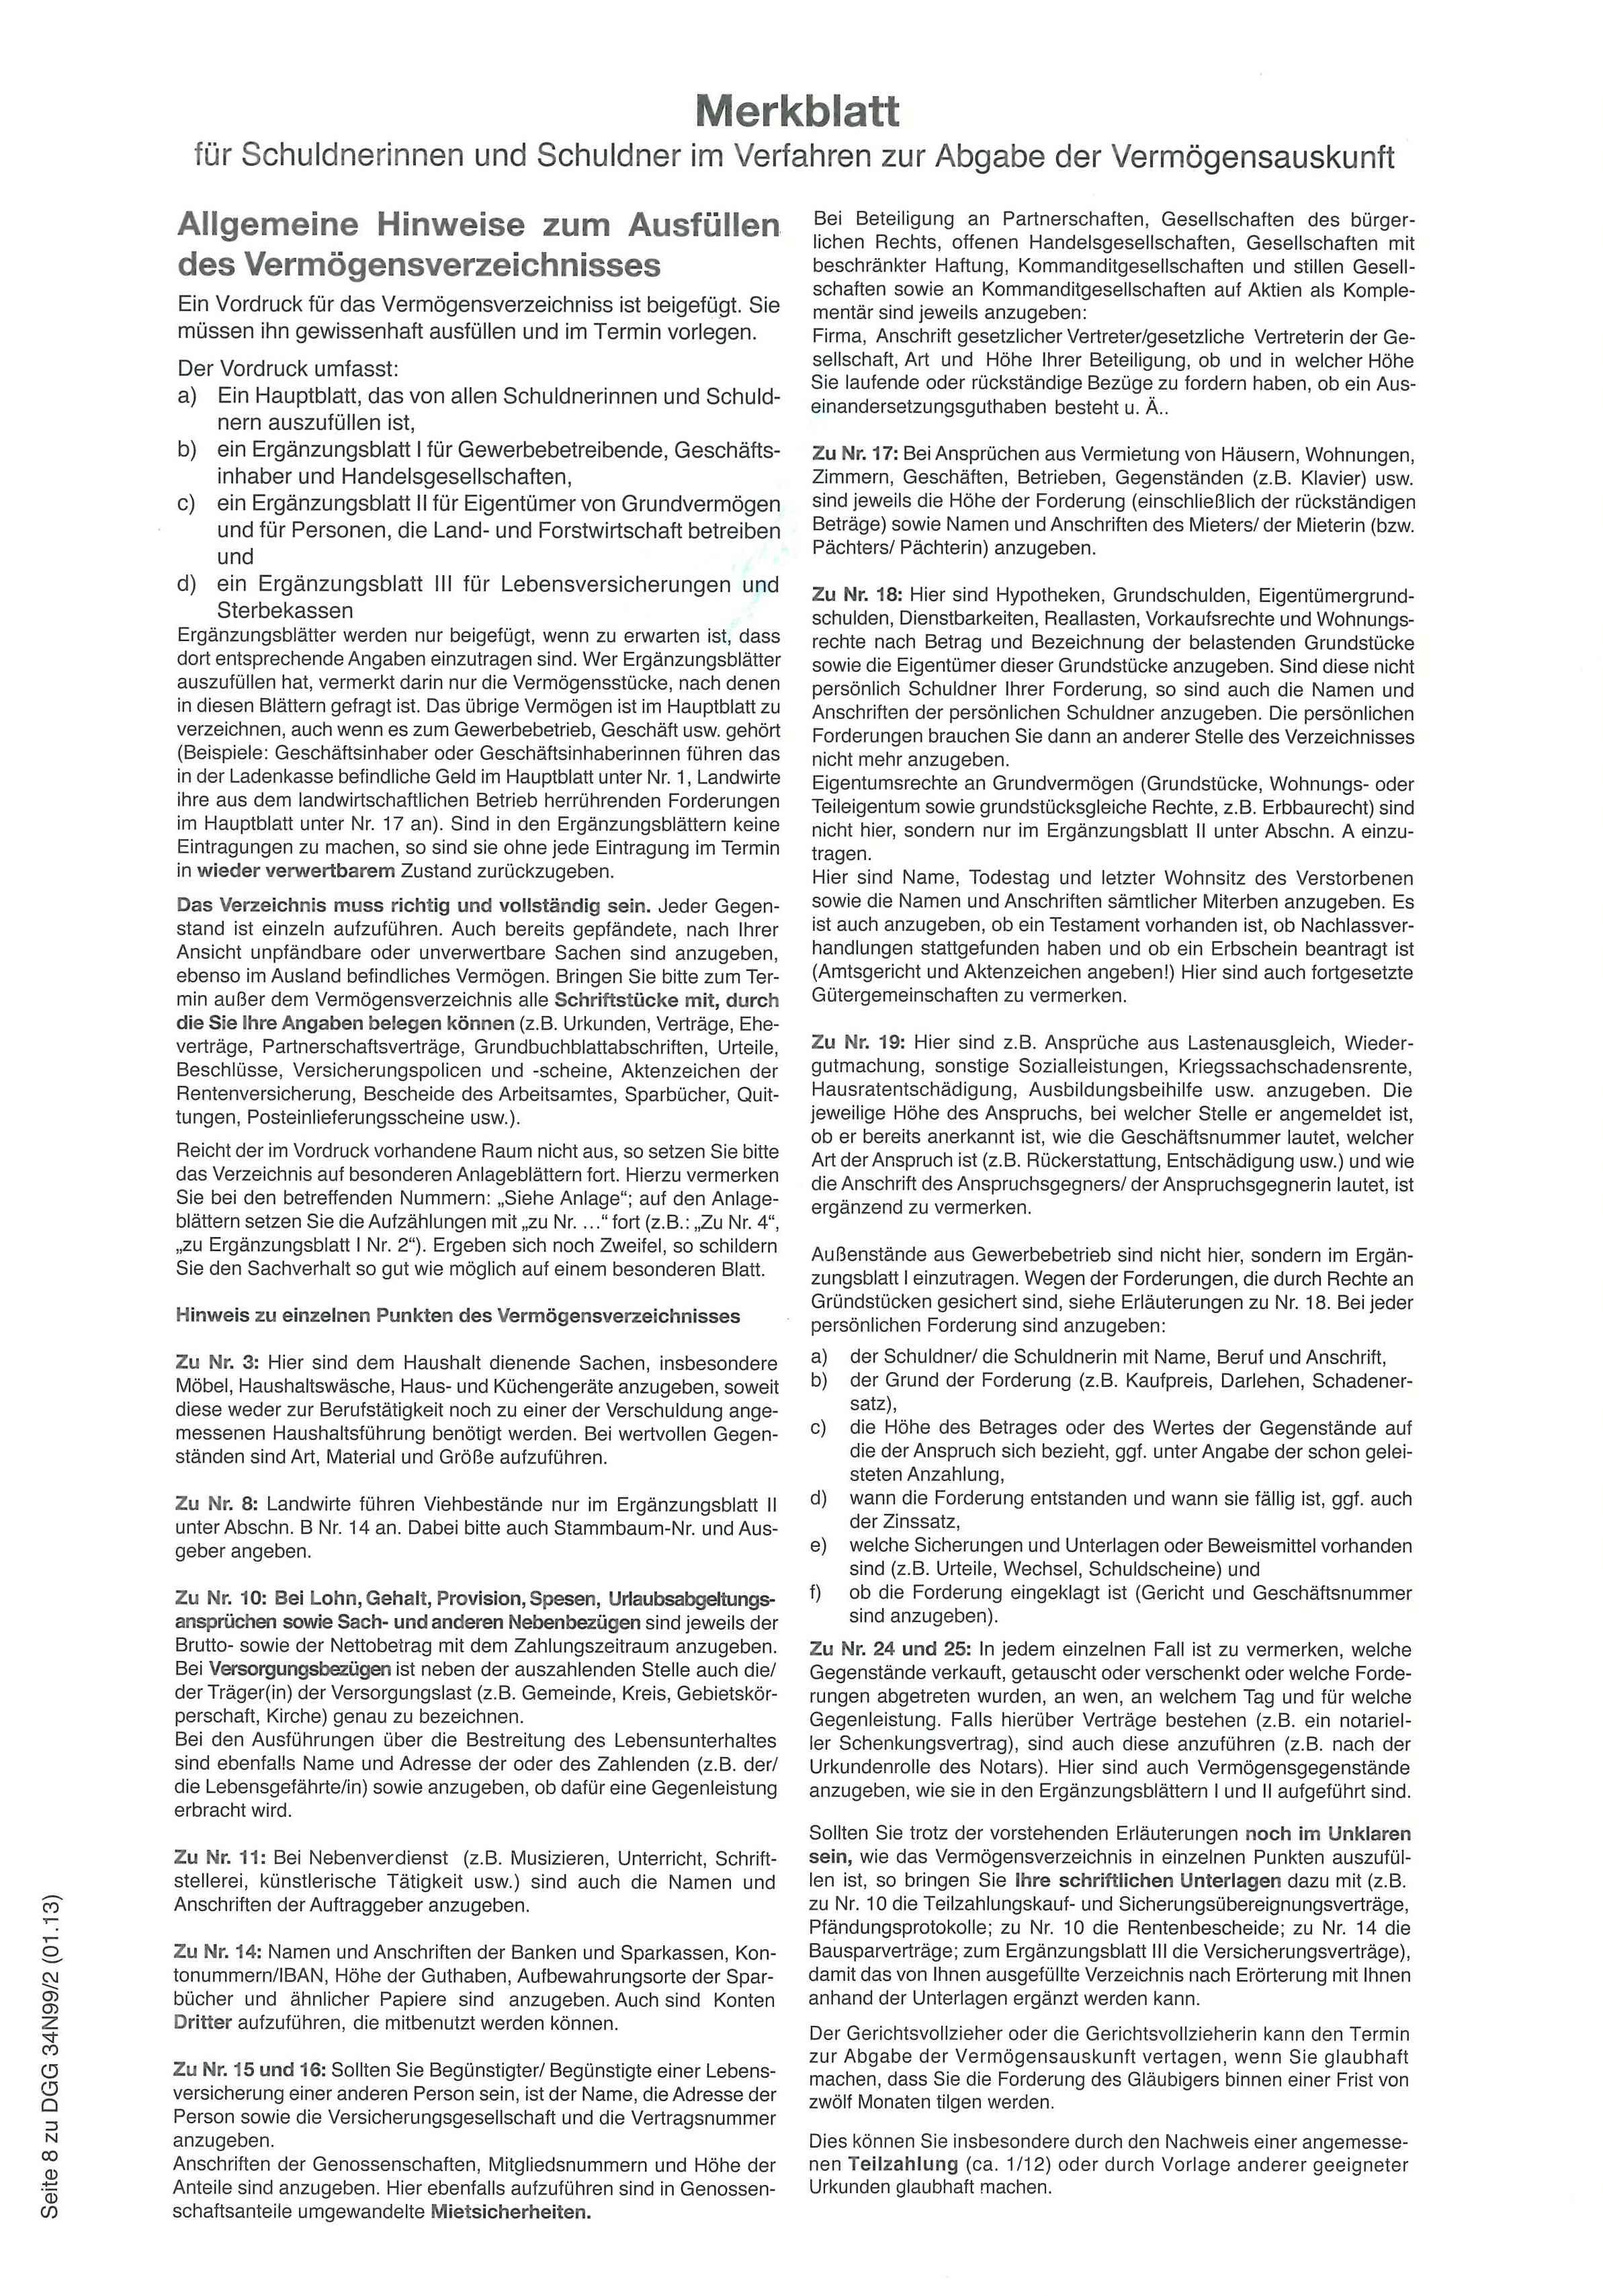 Verm Verz M Merkblatt Nat Person 2 Faltbl Eingest 34n99